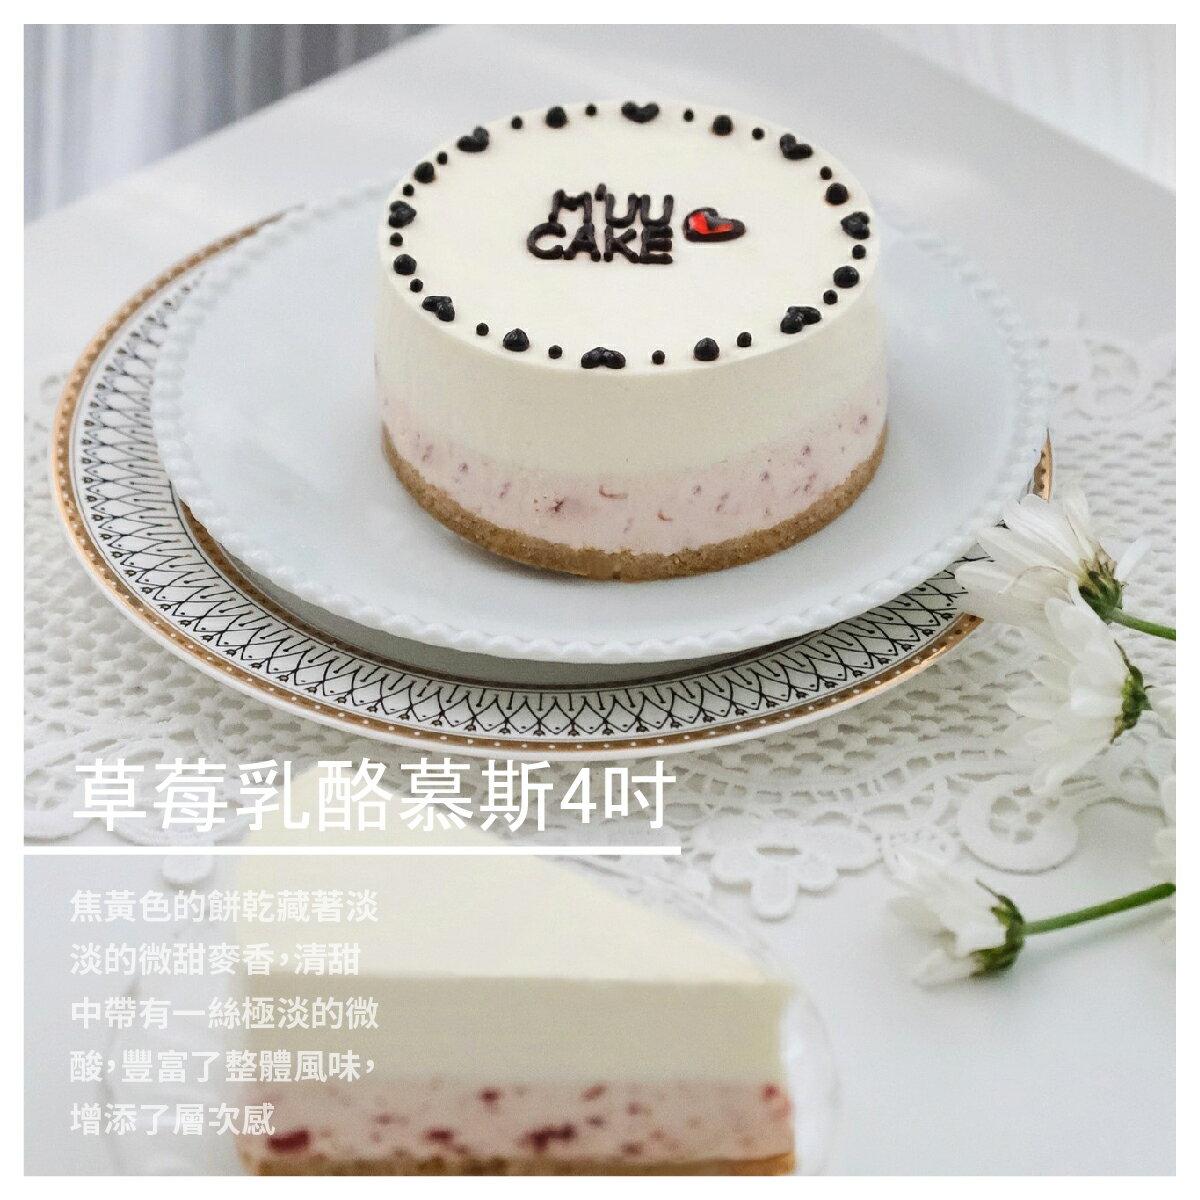 【 M'uu Cake霂克】草莓乳酪慕斯 4吋/6吋